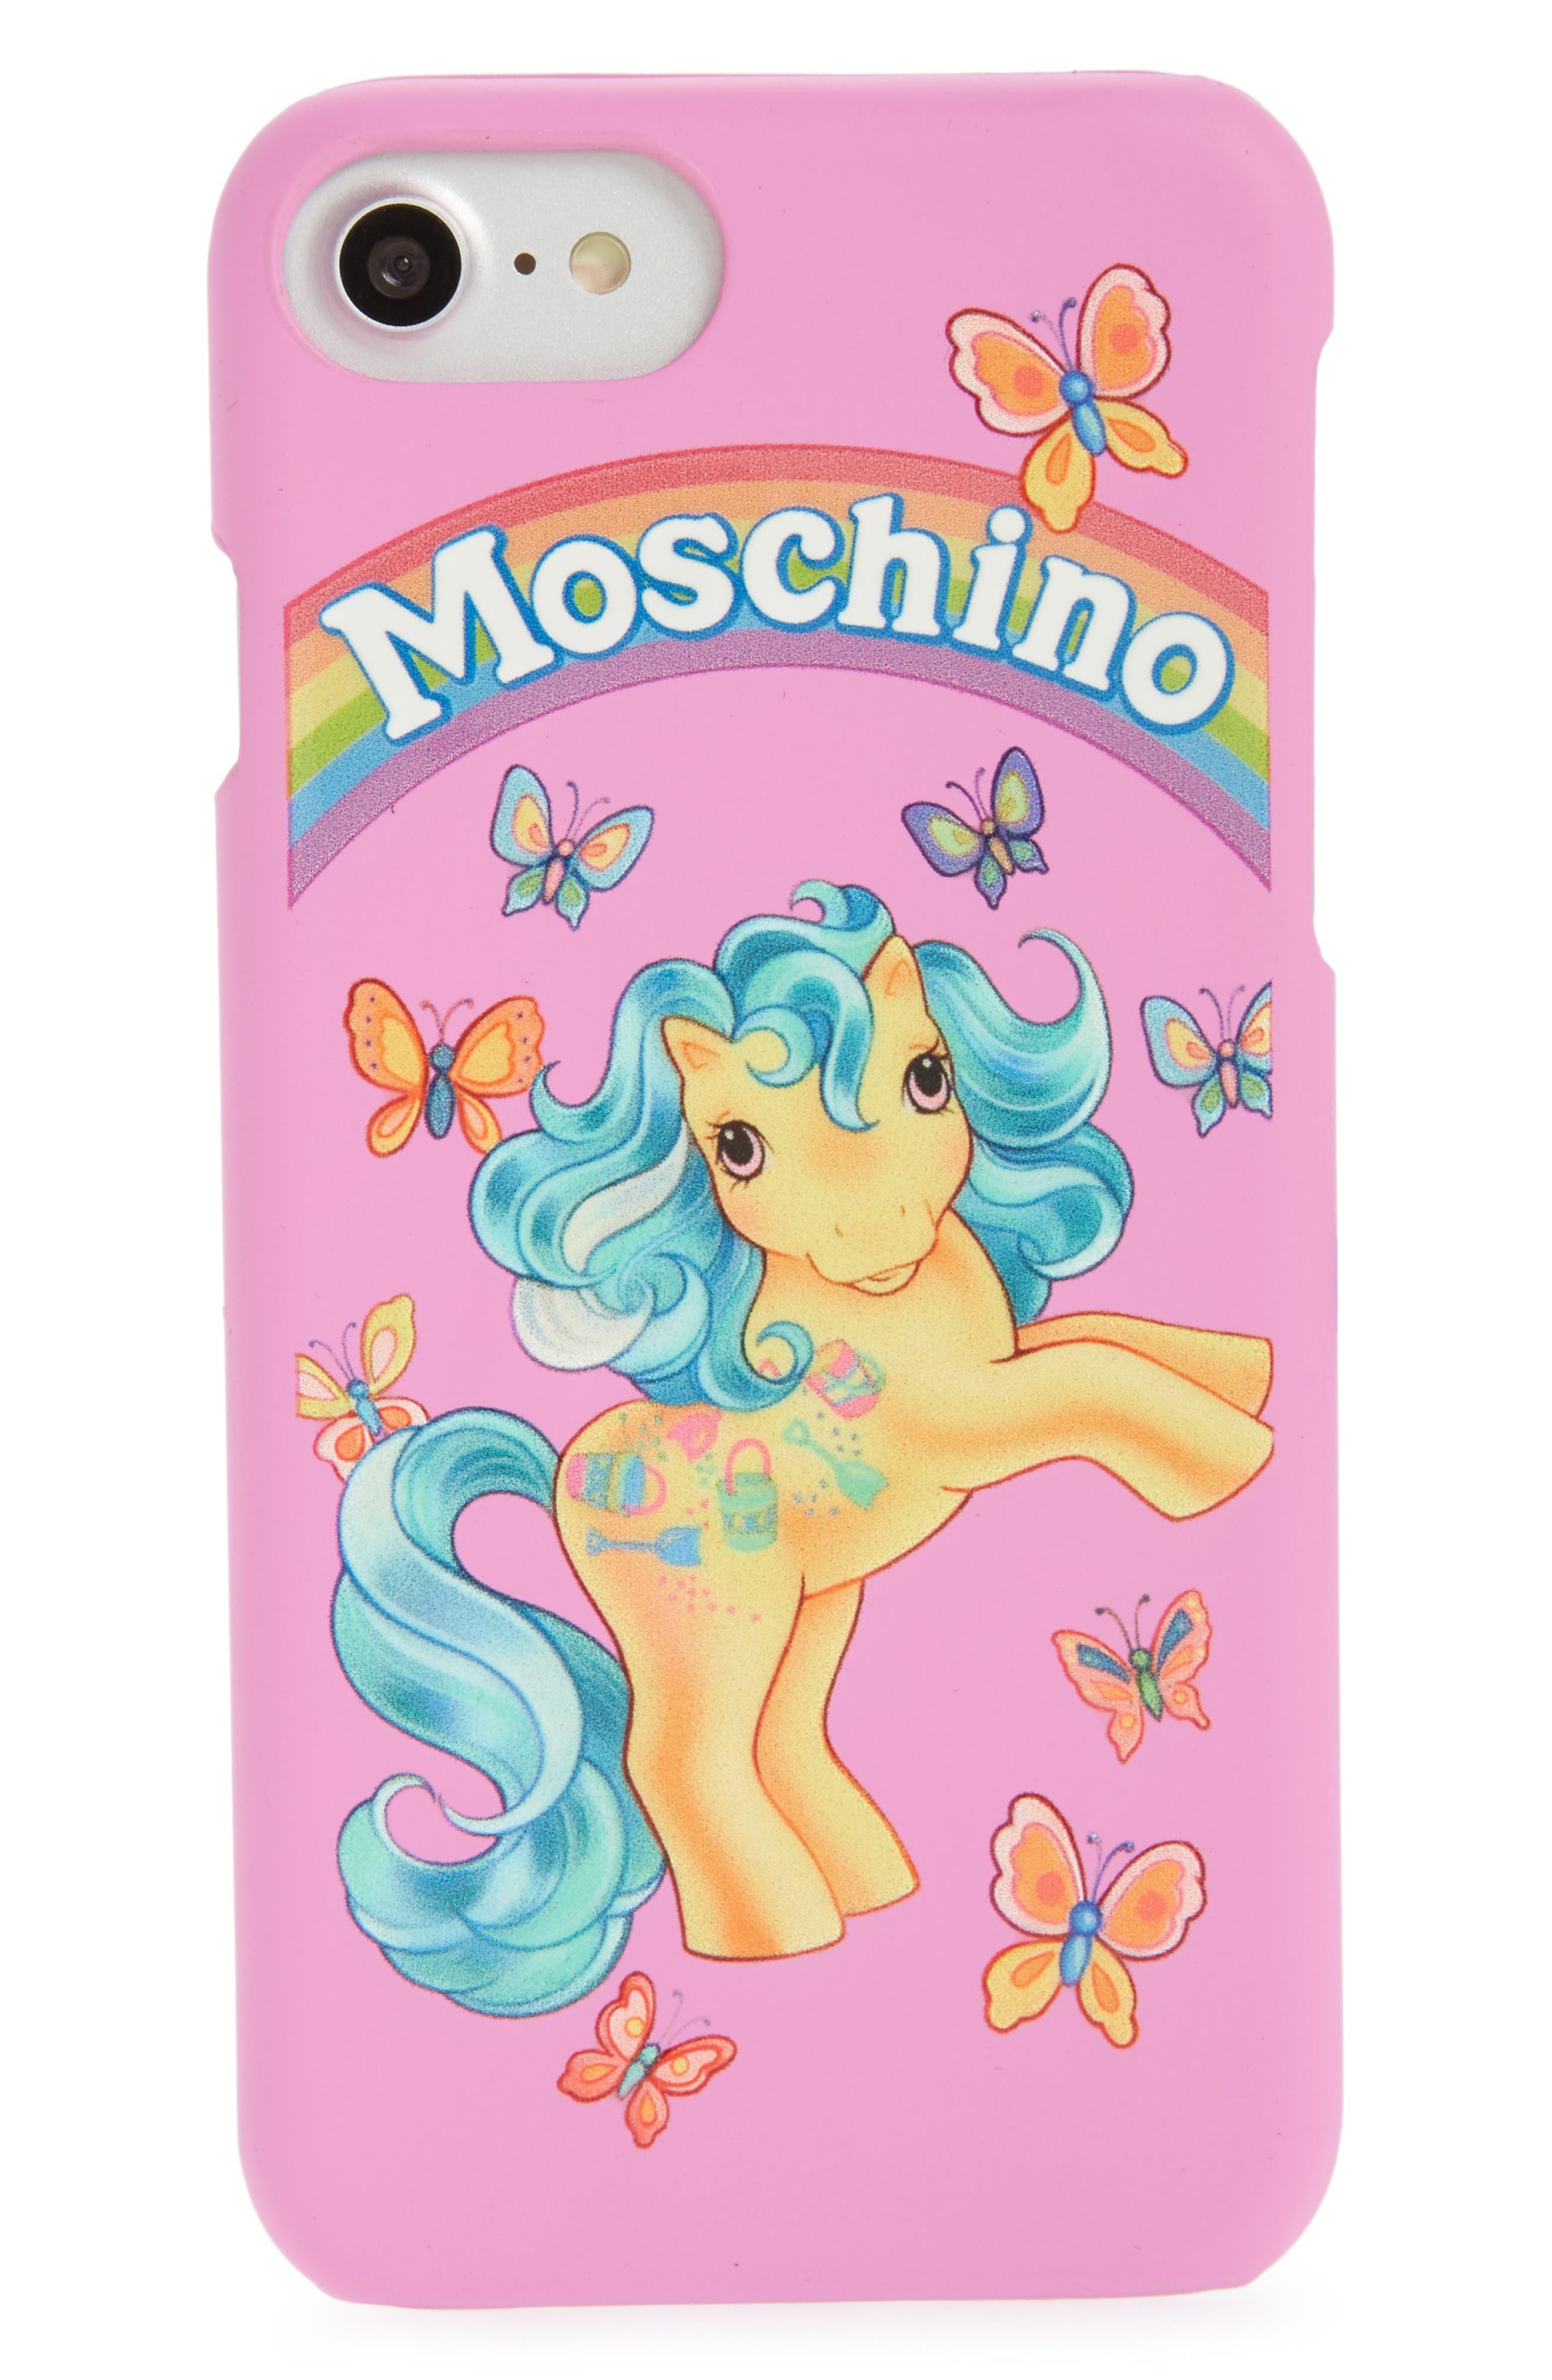 Moschino x My Little Pony iPhone 6/6s & 7 Case